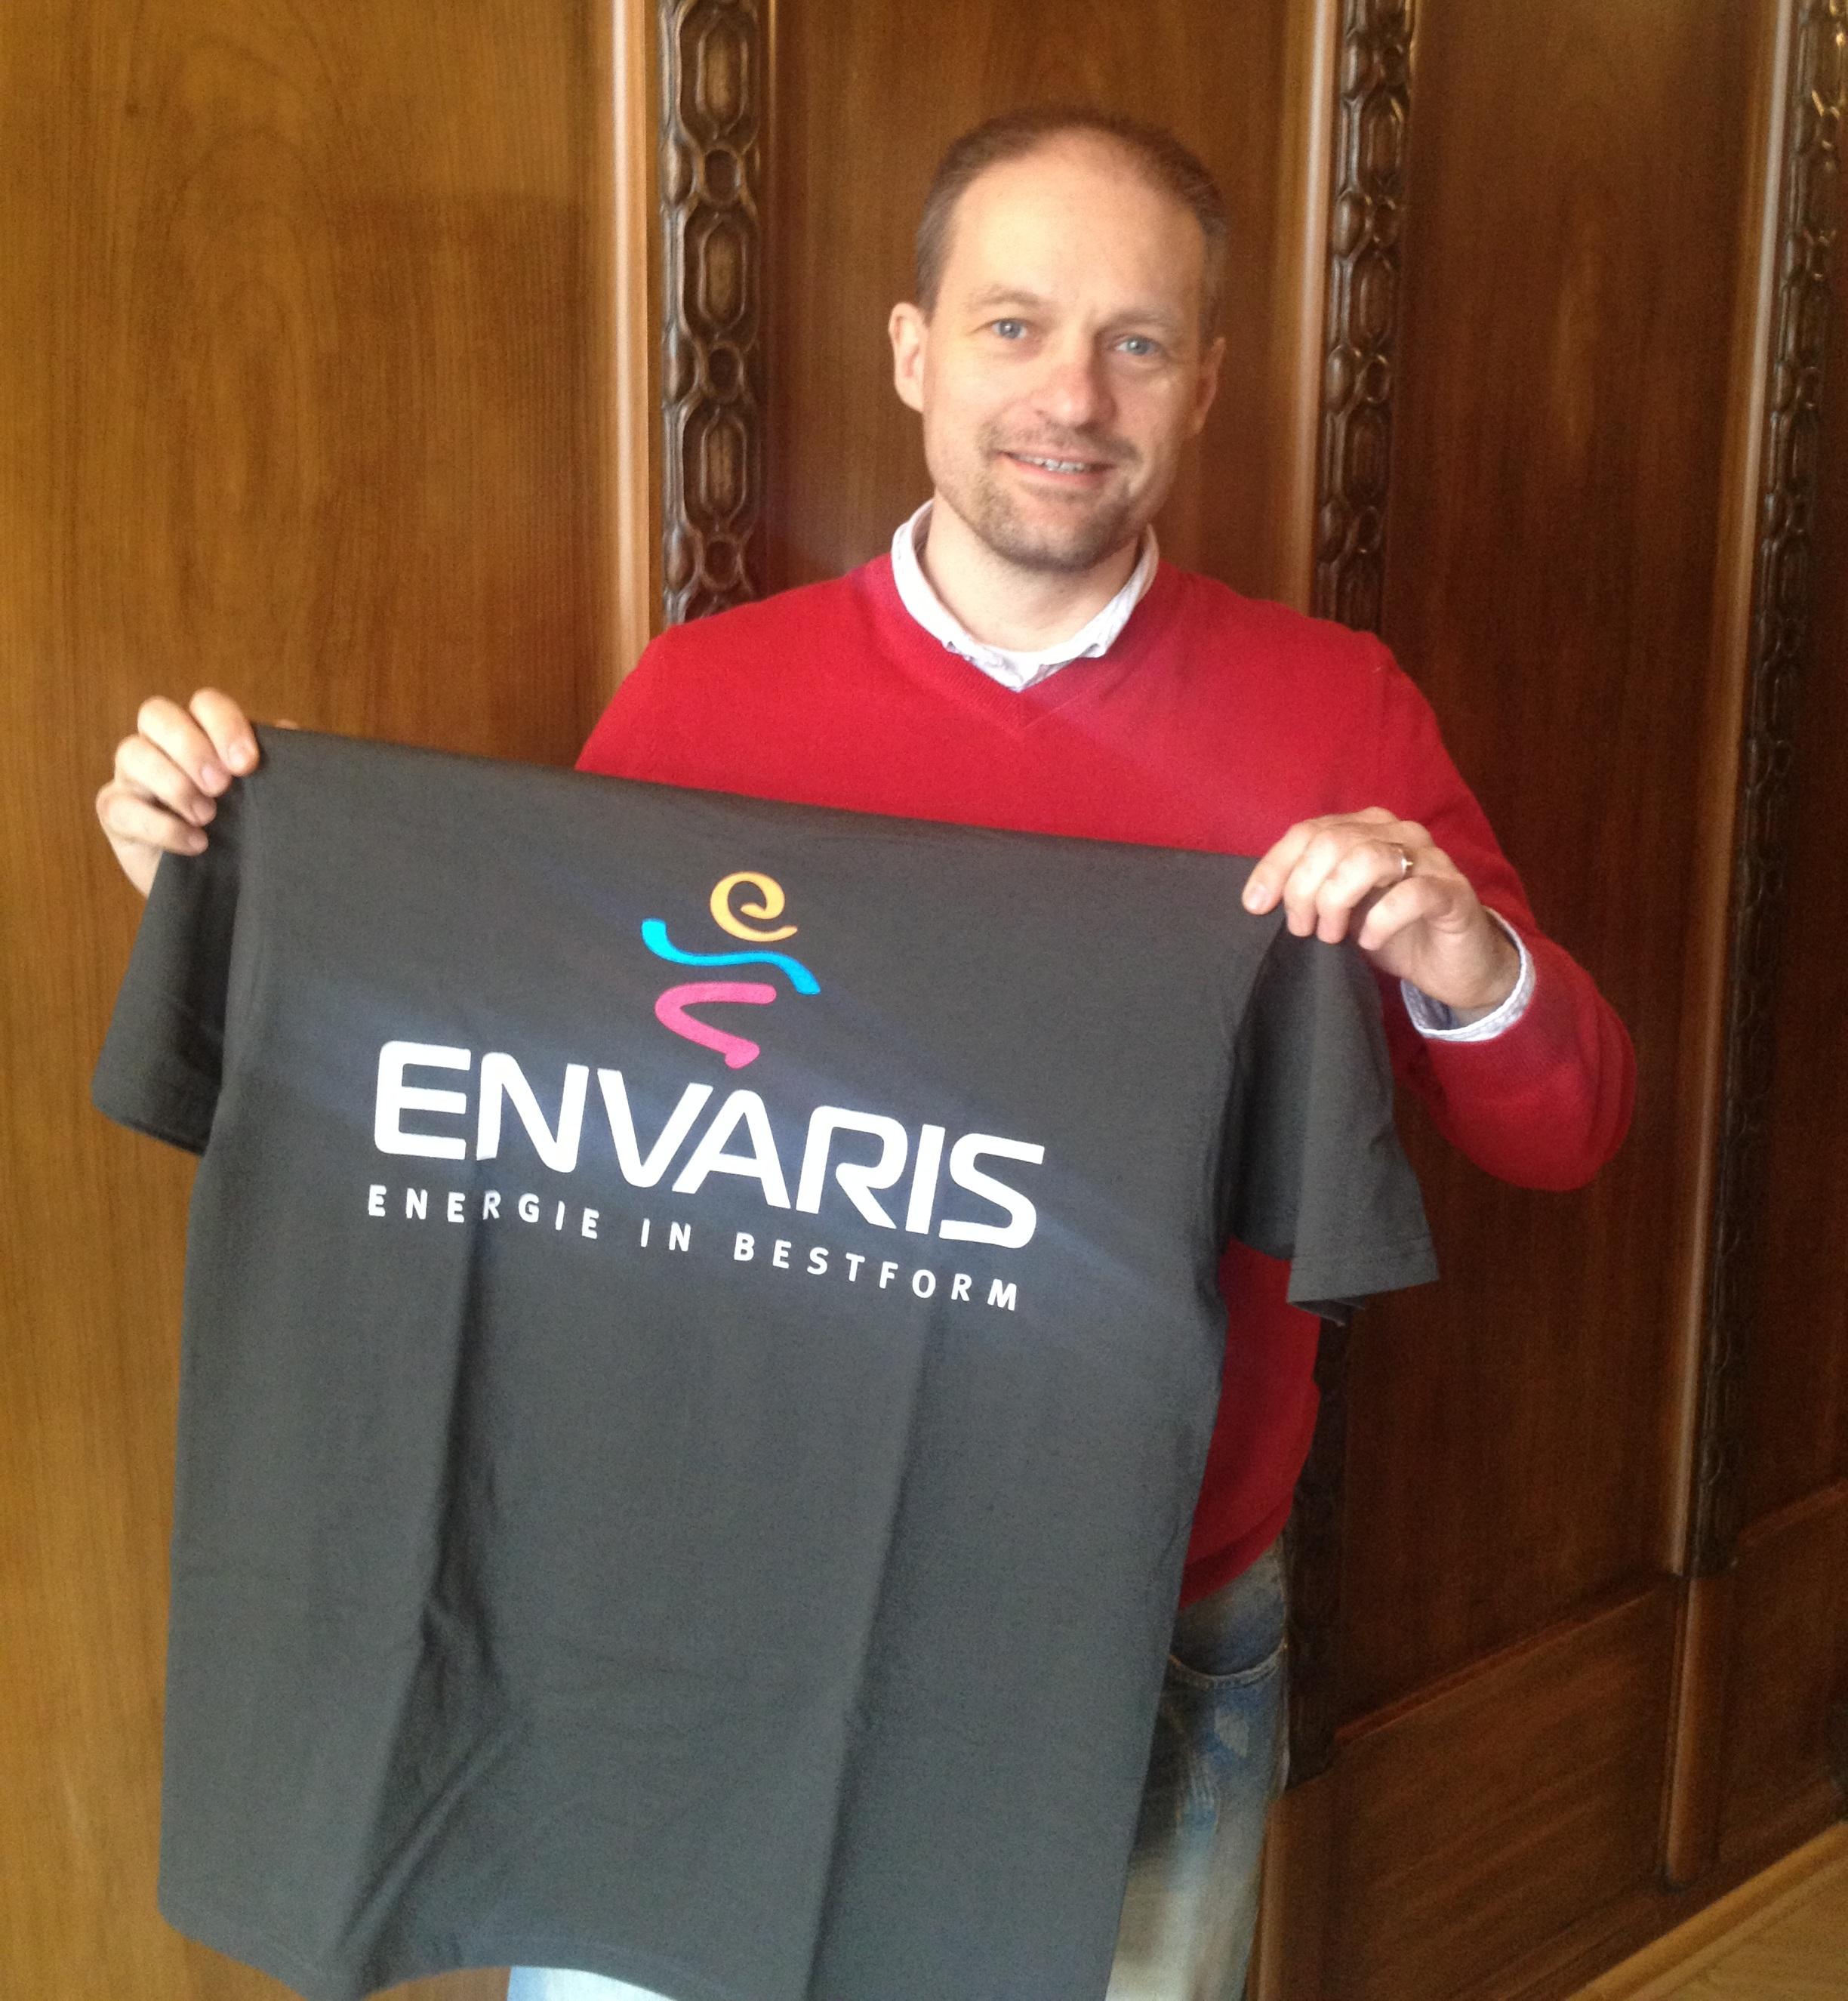 envaris präsentiert den neuen Content-Partner